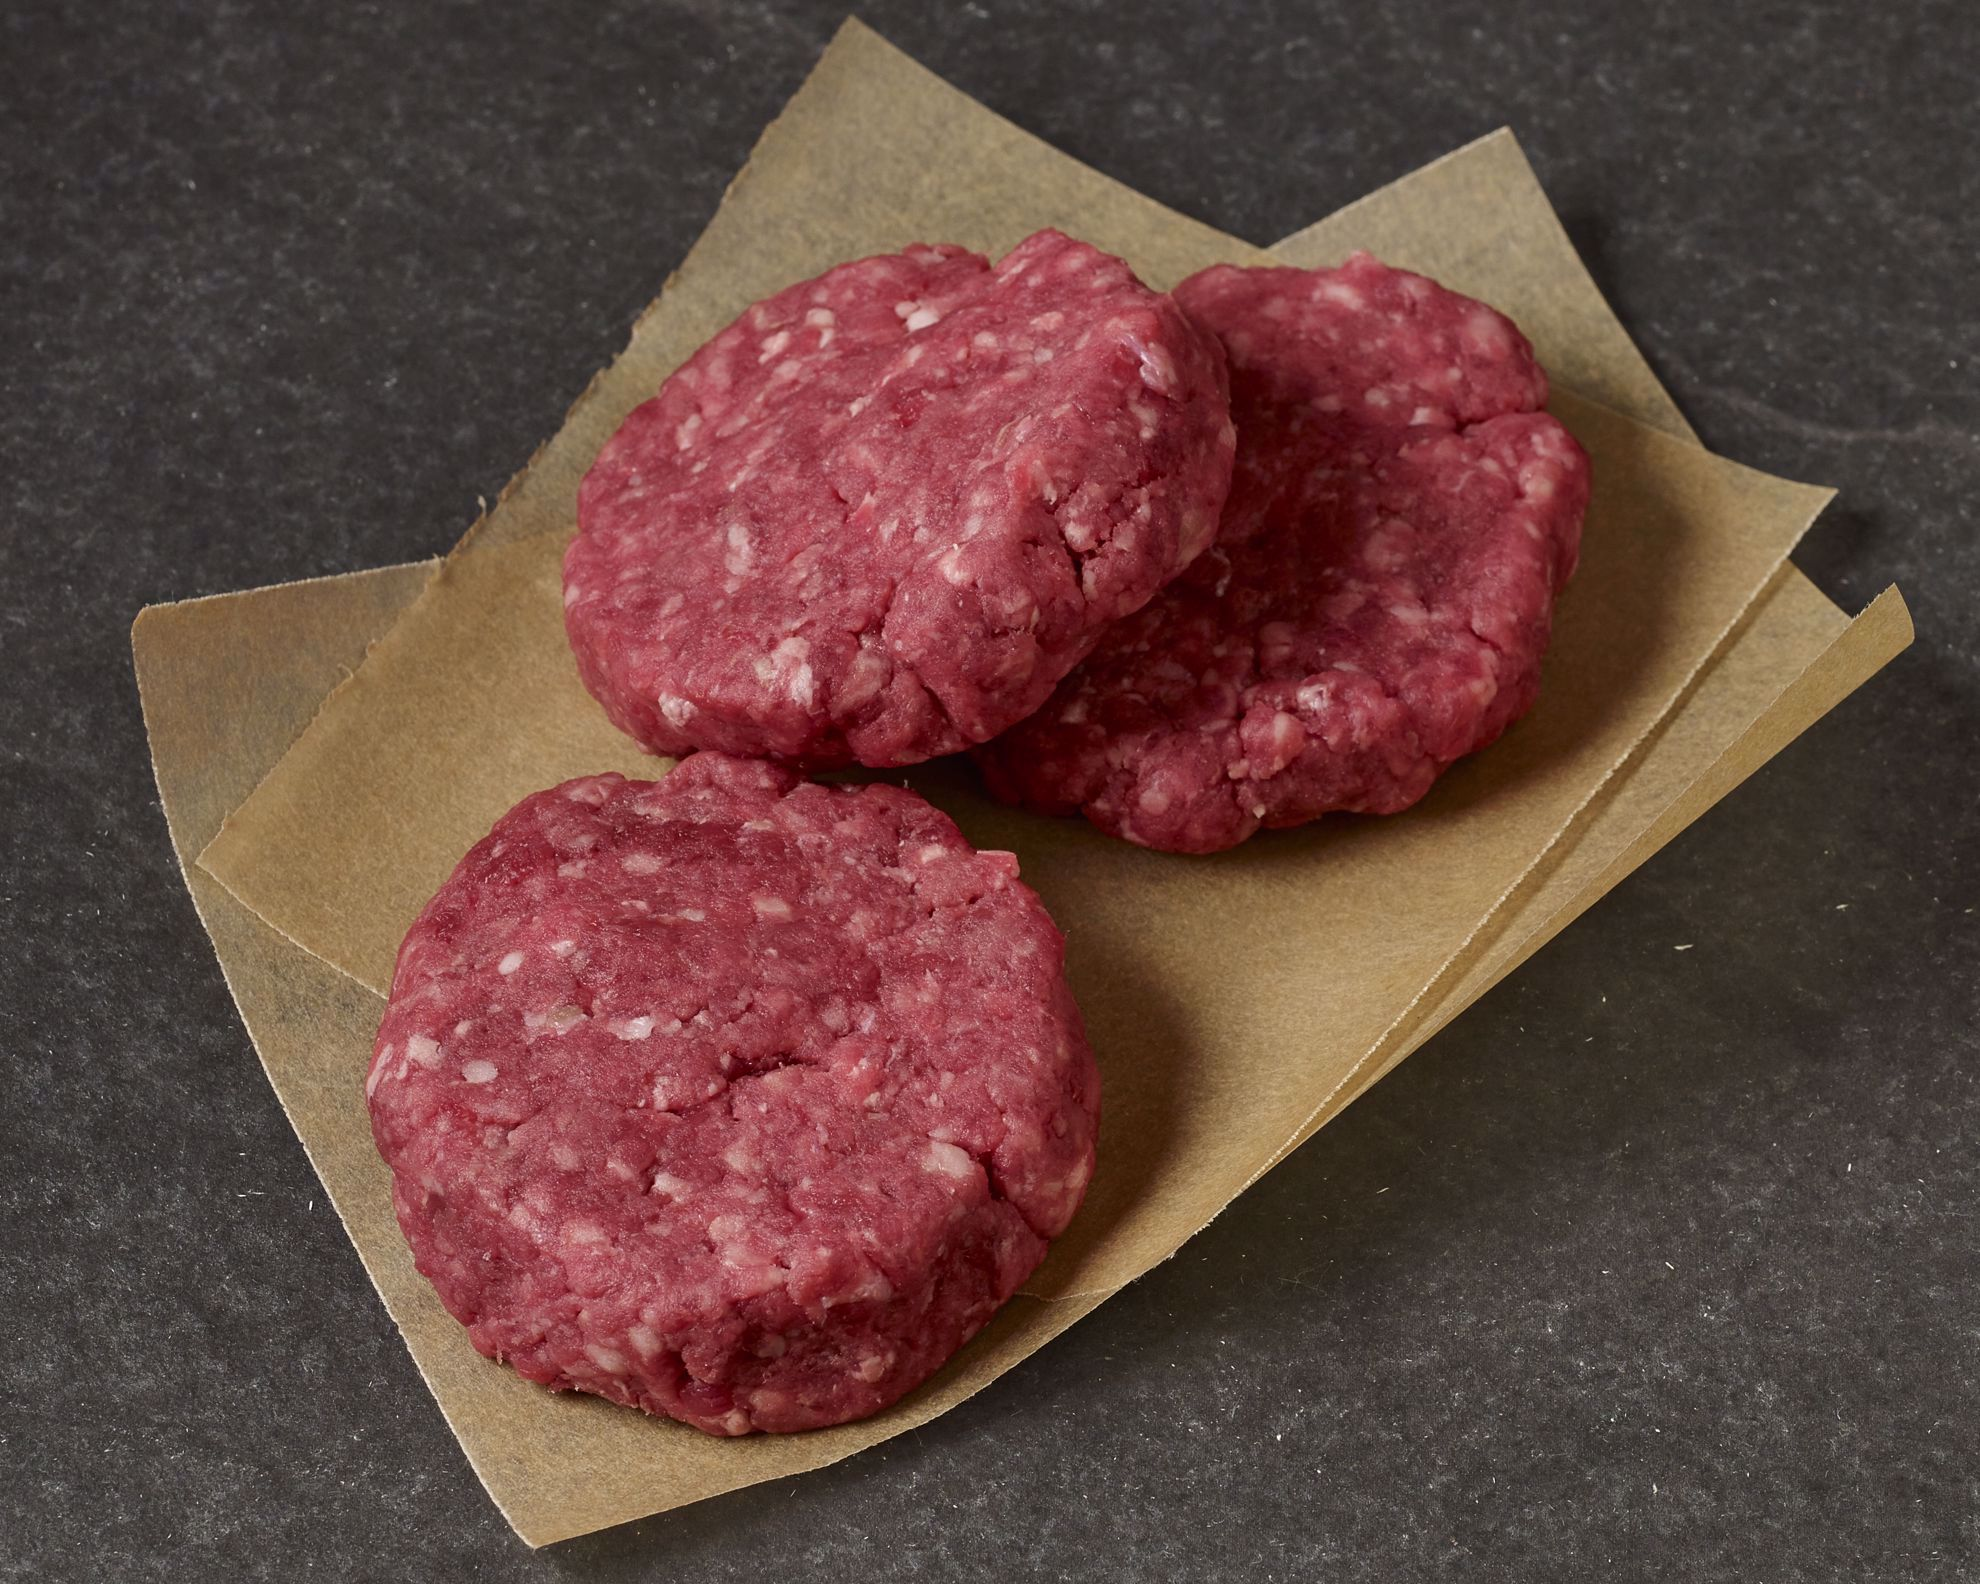 USDA Prime Beef Sliders